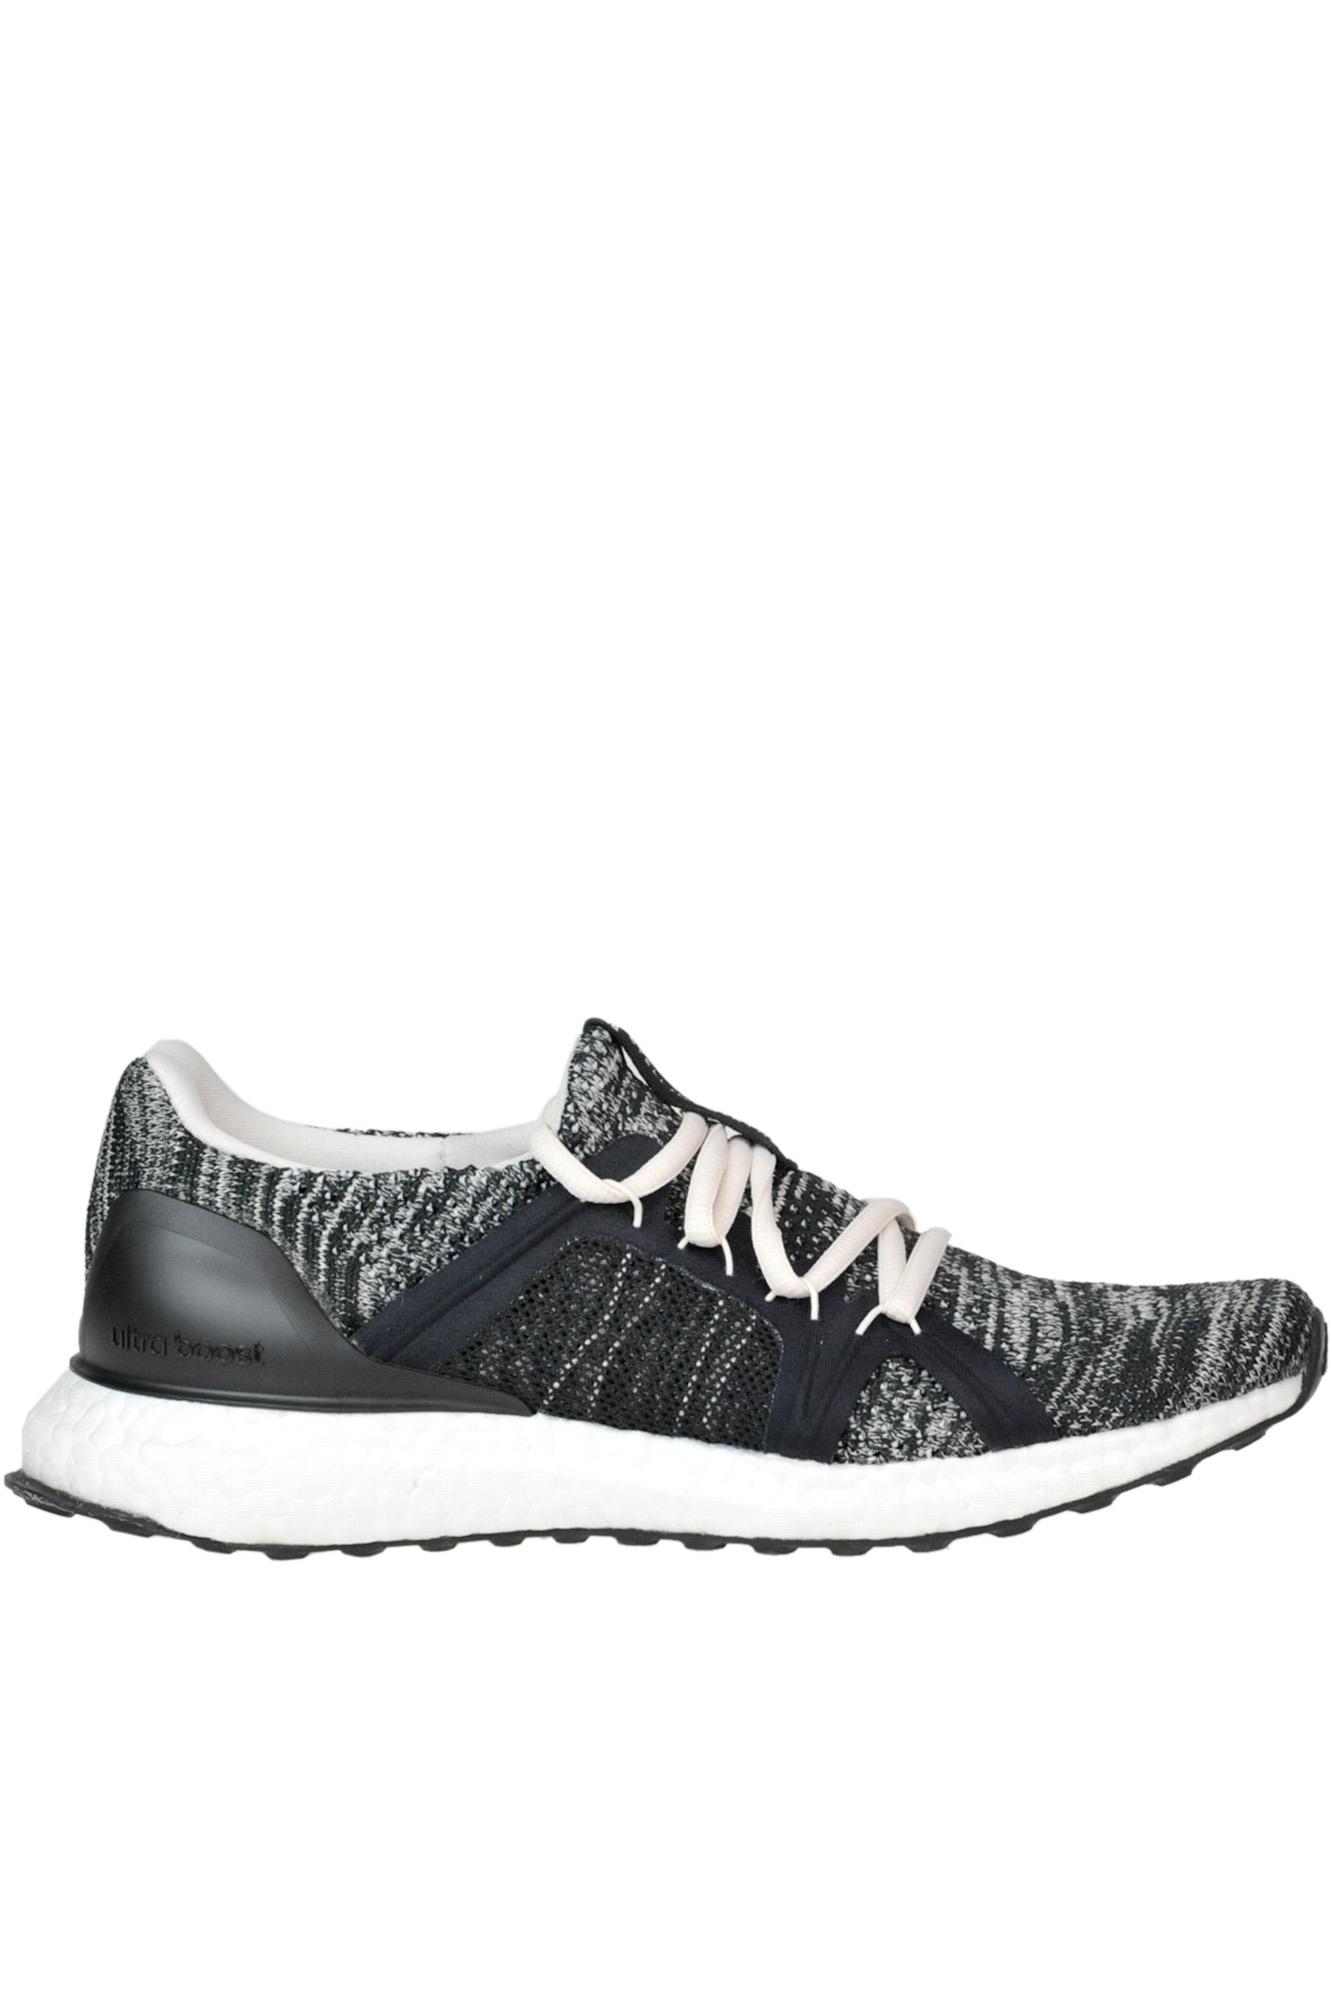 91f66660ae3 Adidas By Stella Mccartney  Ultraboost Parley  Sneakers In Black ...